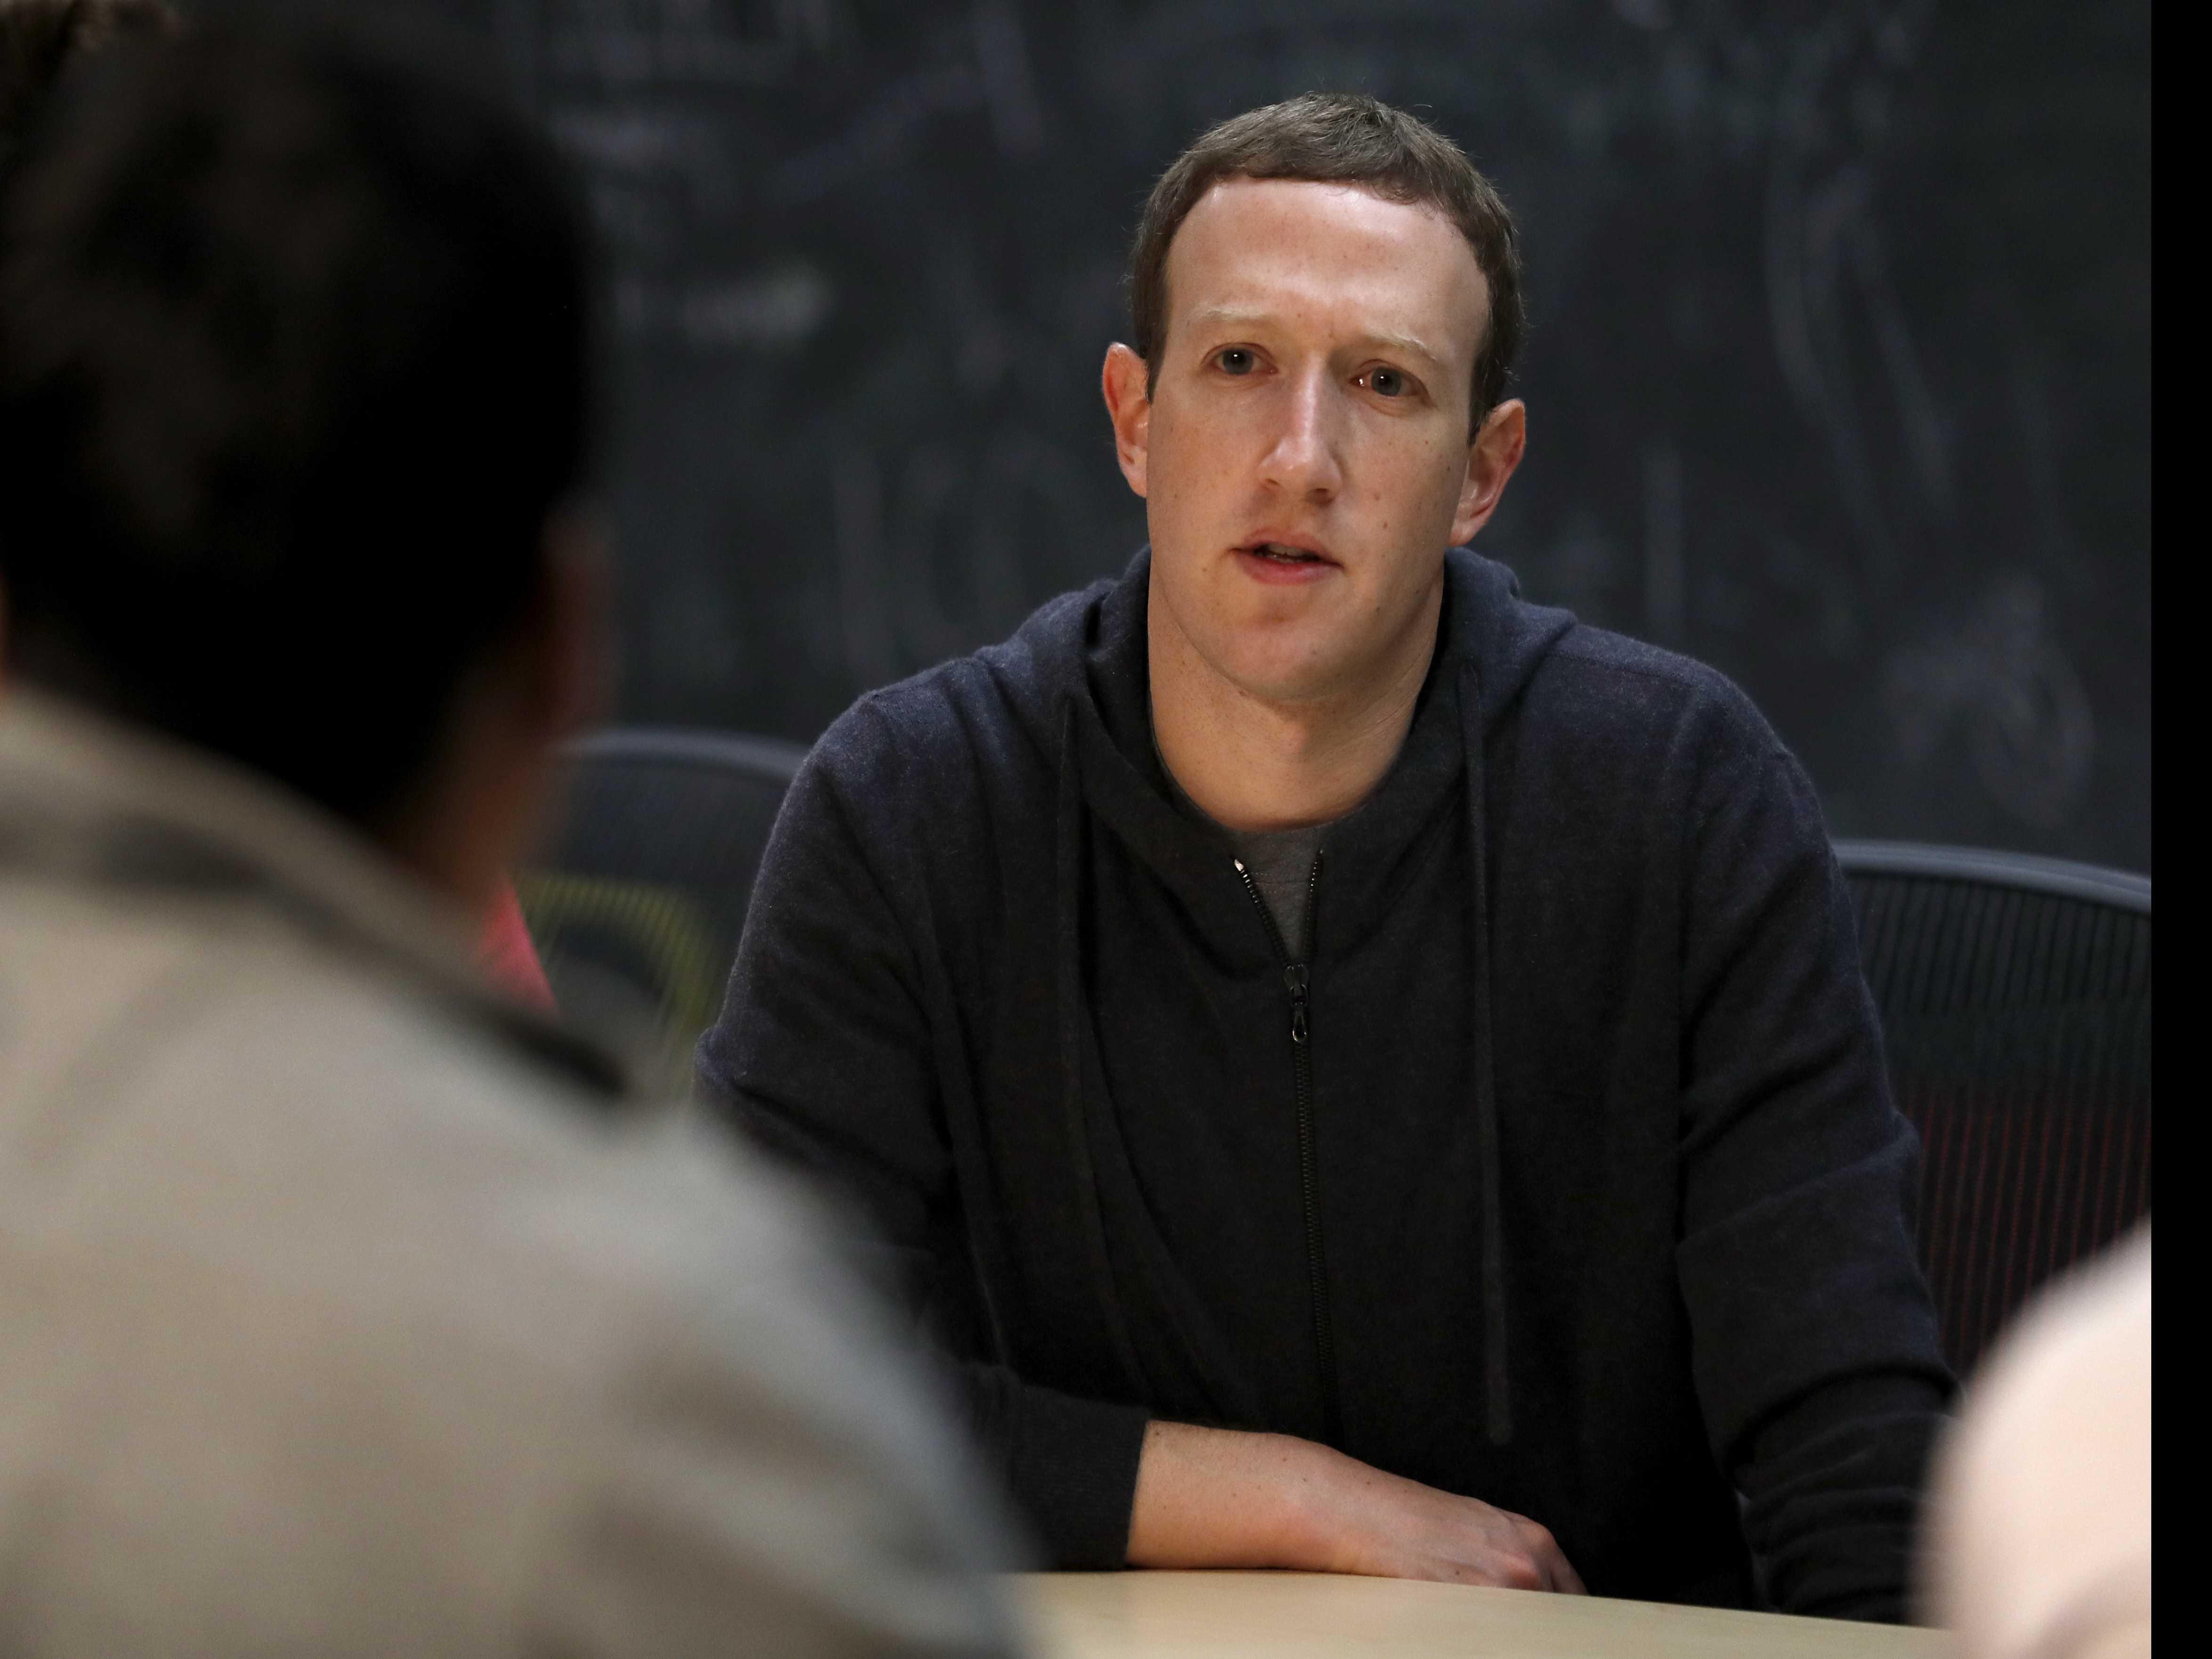 Facebook to Emphasize 'Trustworthy' News Via User Surveys